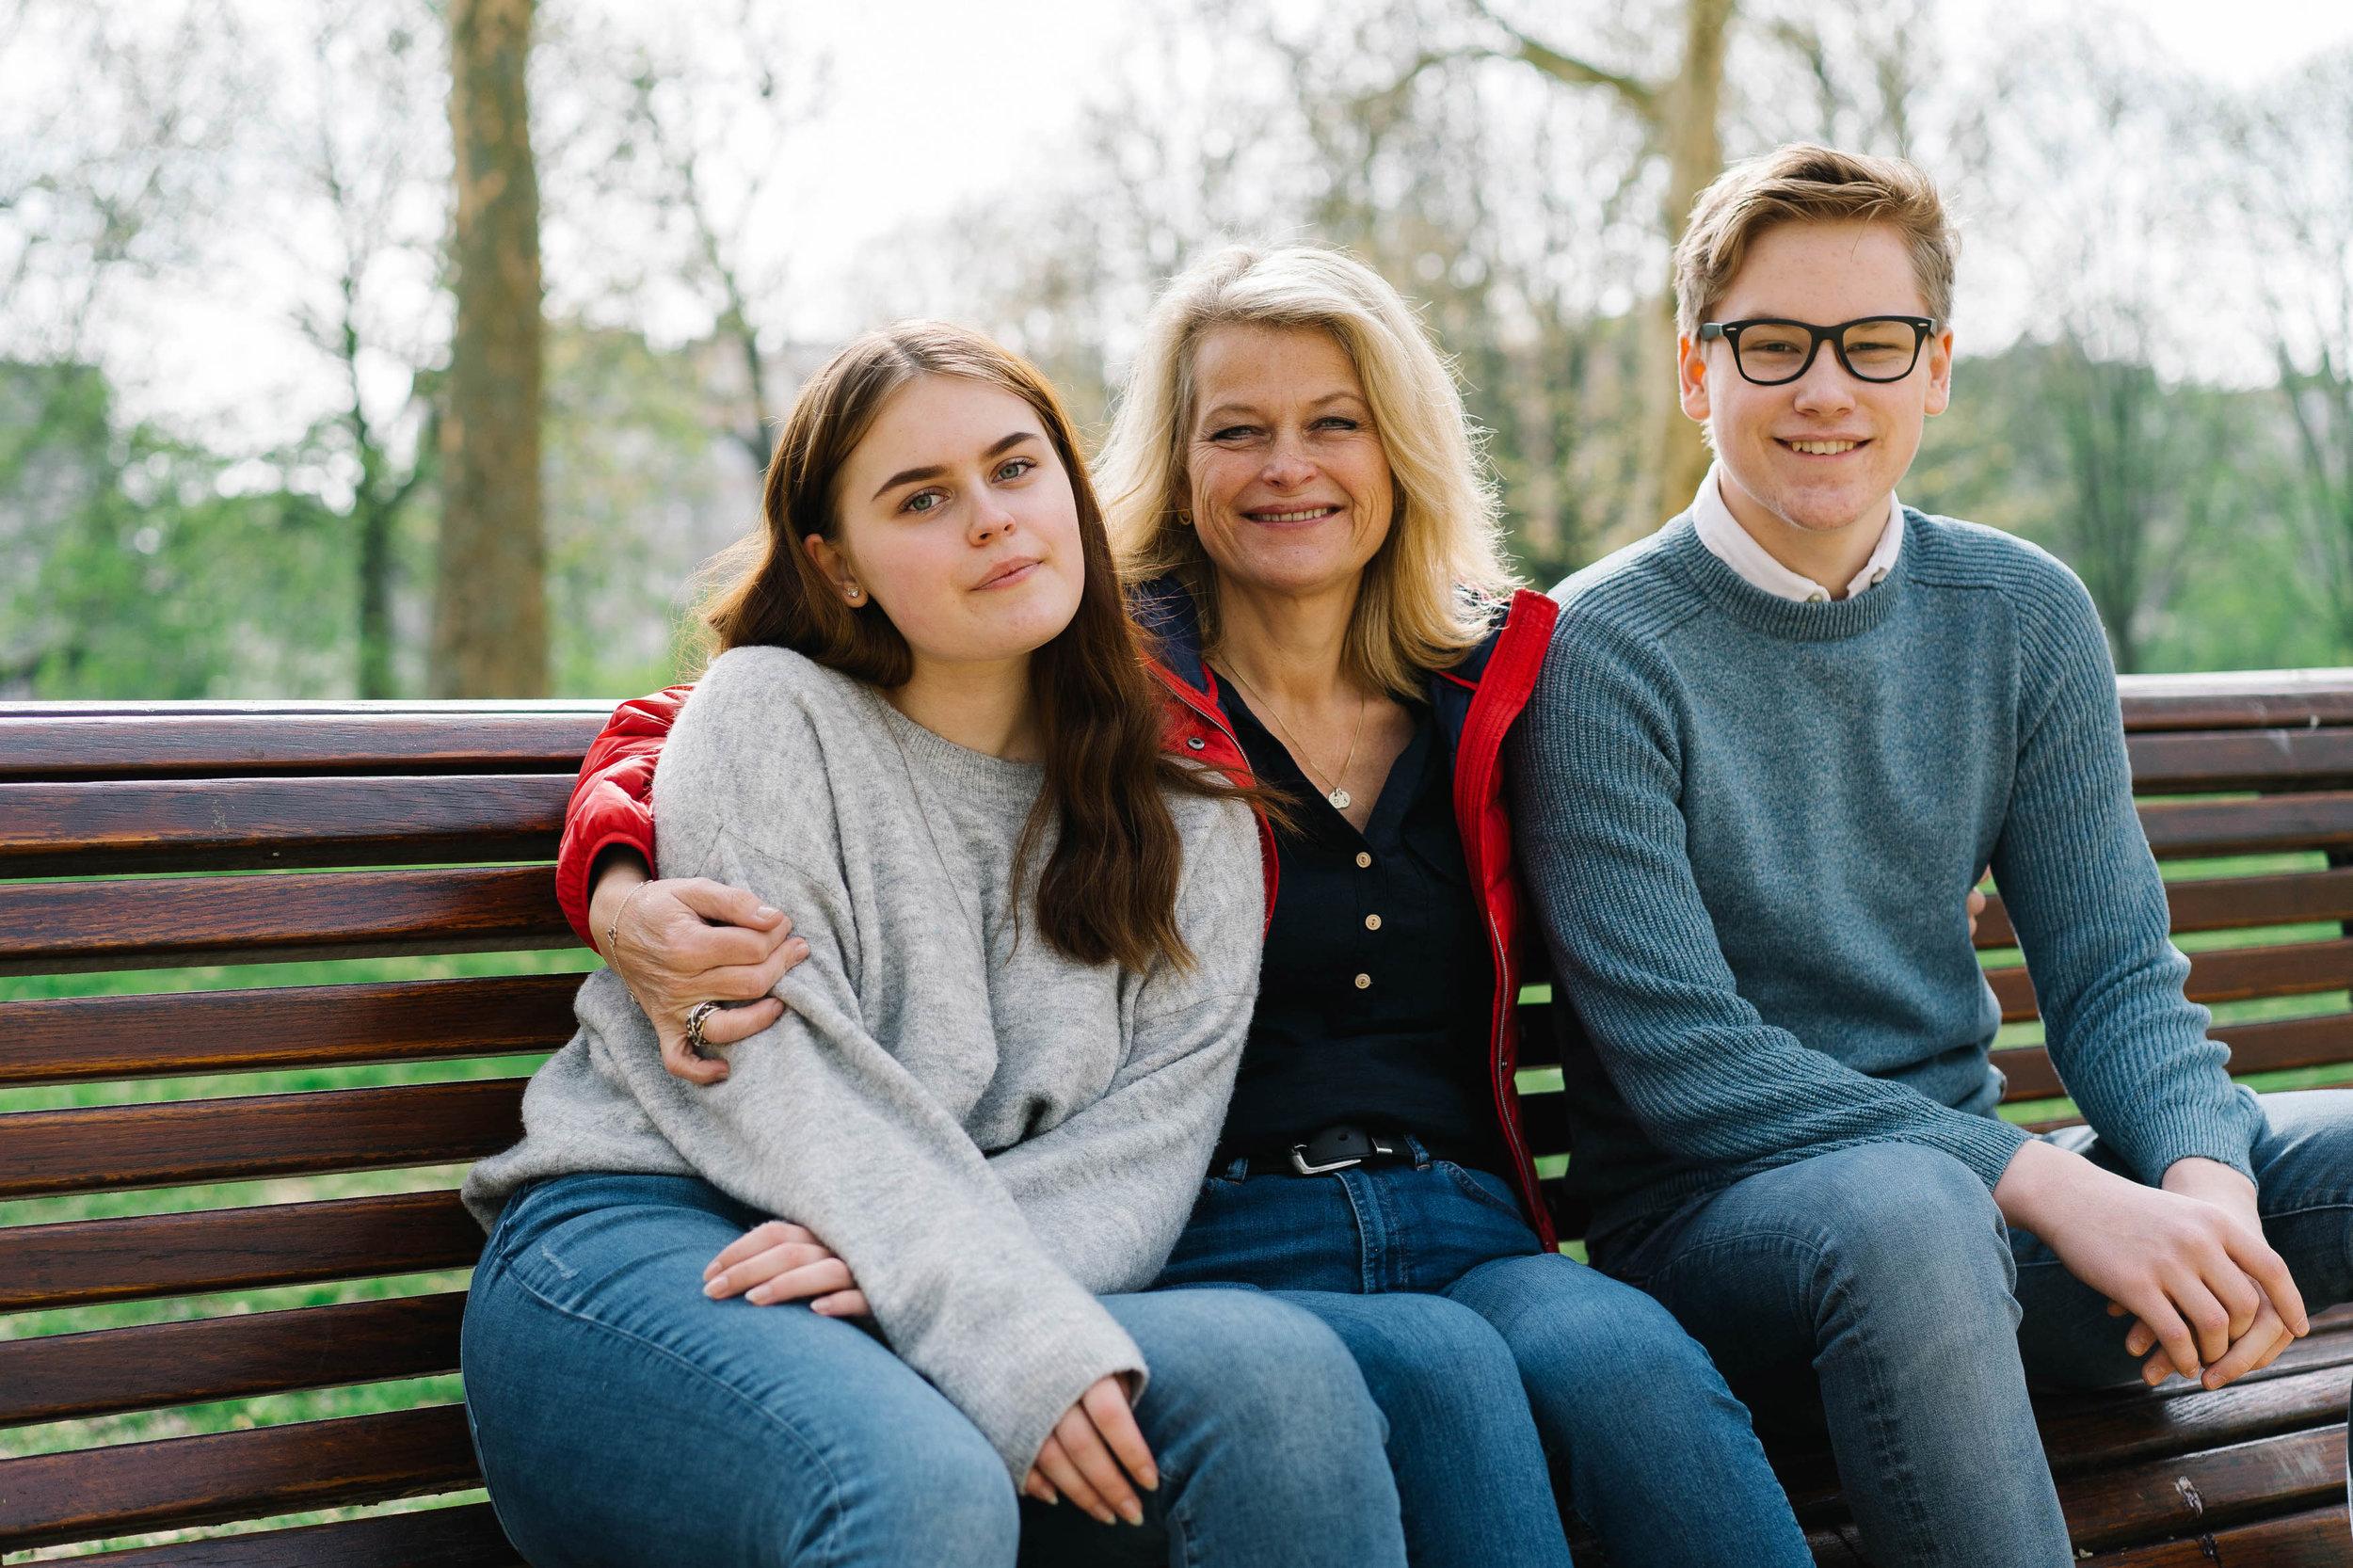 photographe-famille-bruxelles-portrait-6.jpg